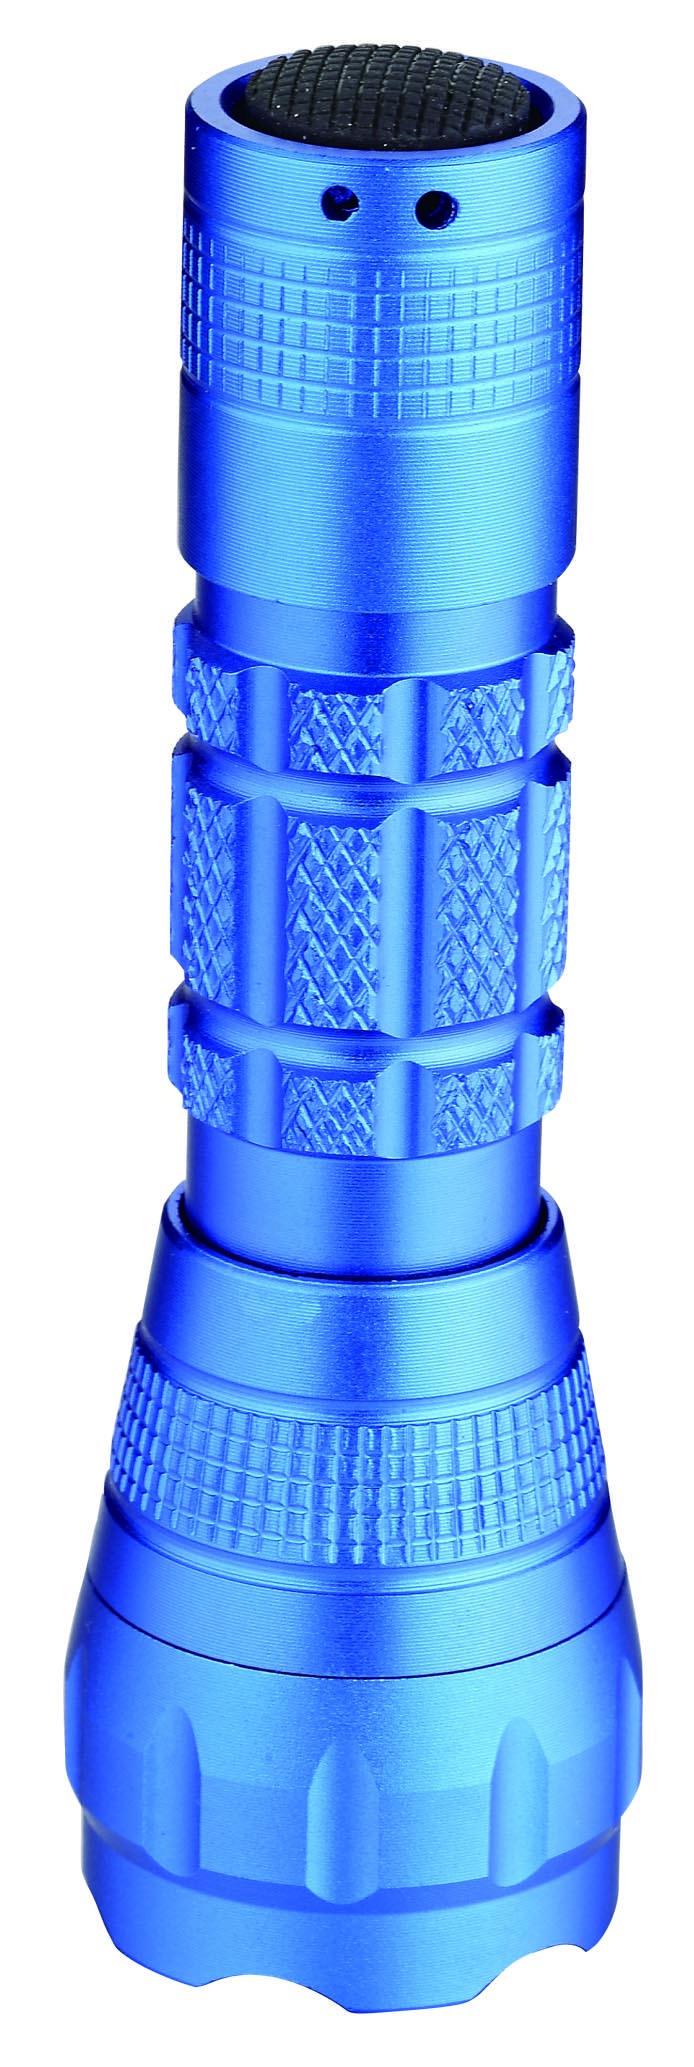 Cree Q3 Brightness High power flishing LED flashlight